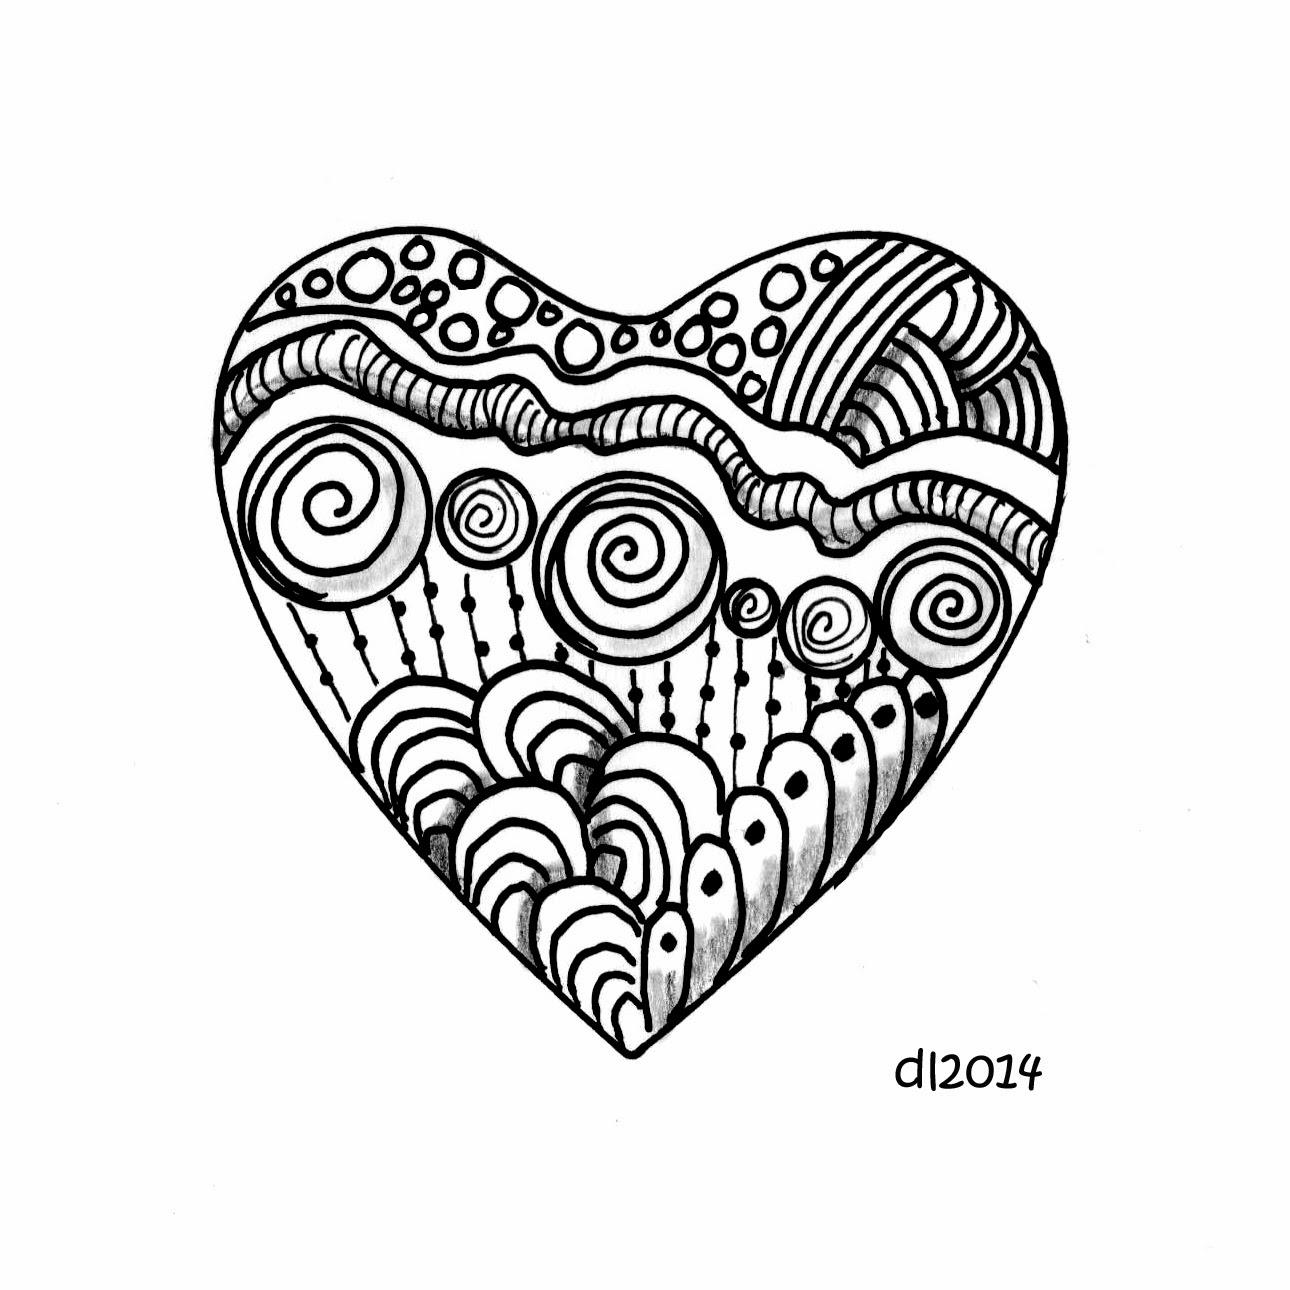 Bird On The Head Zendoodle Heart